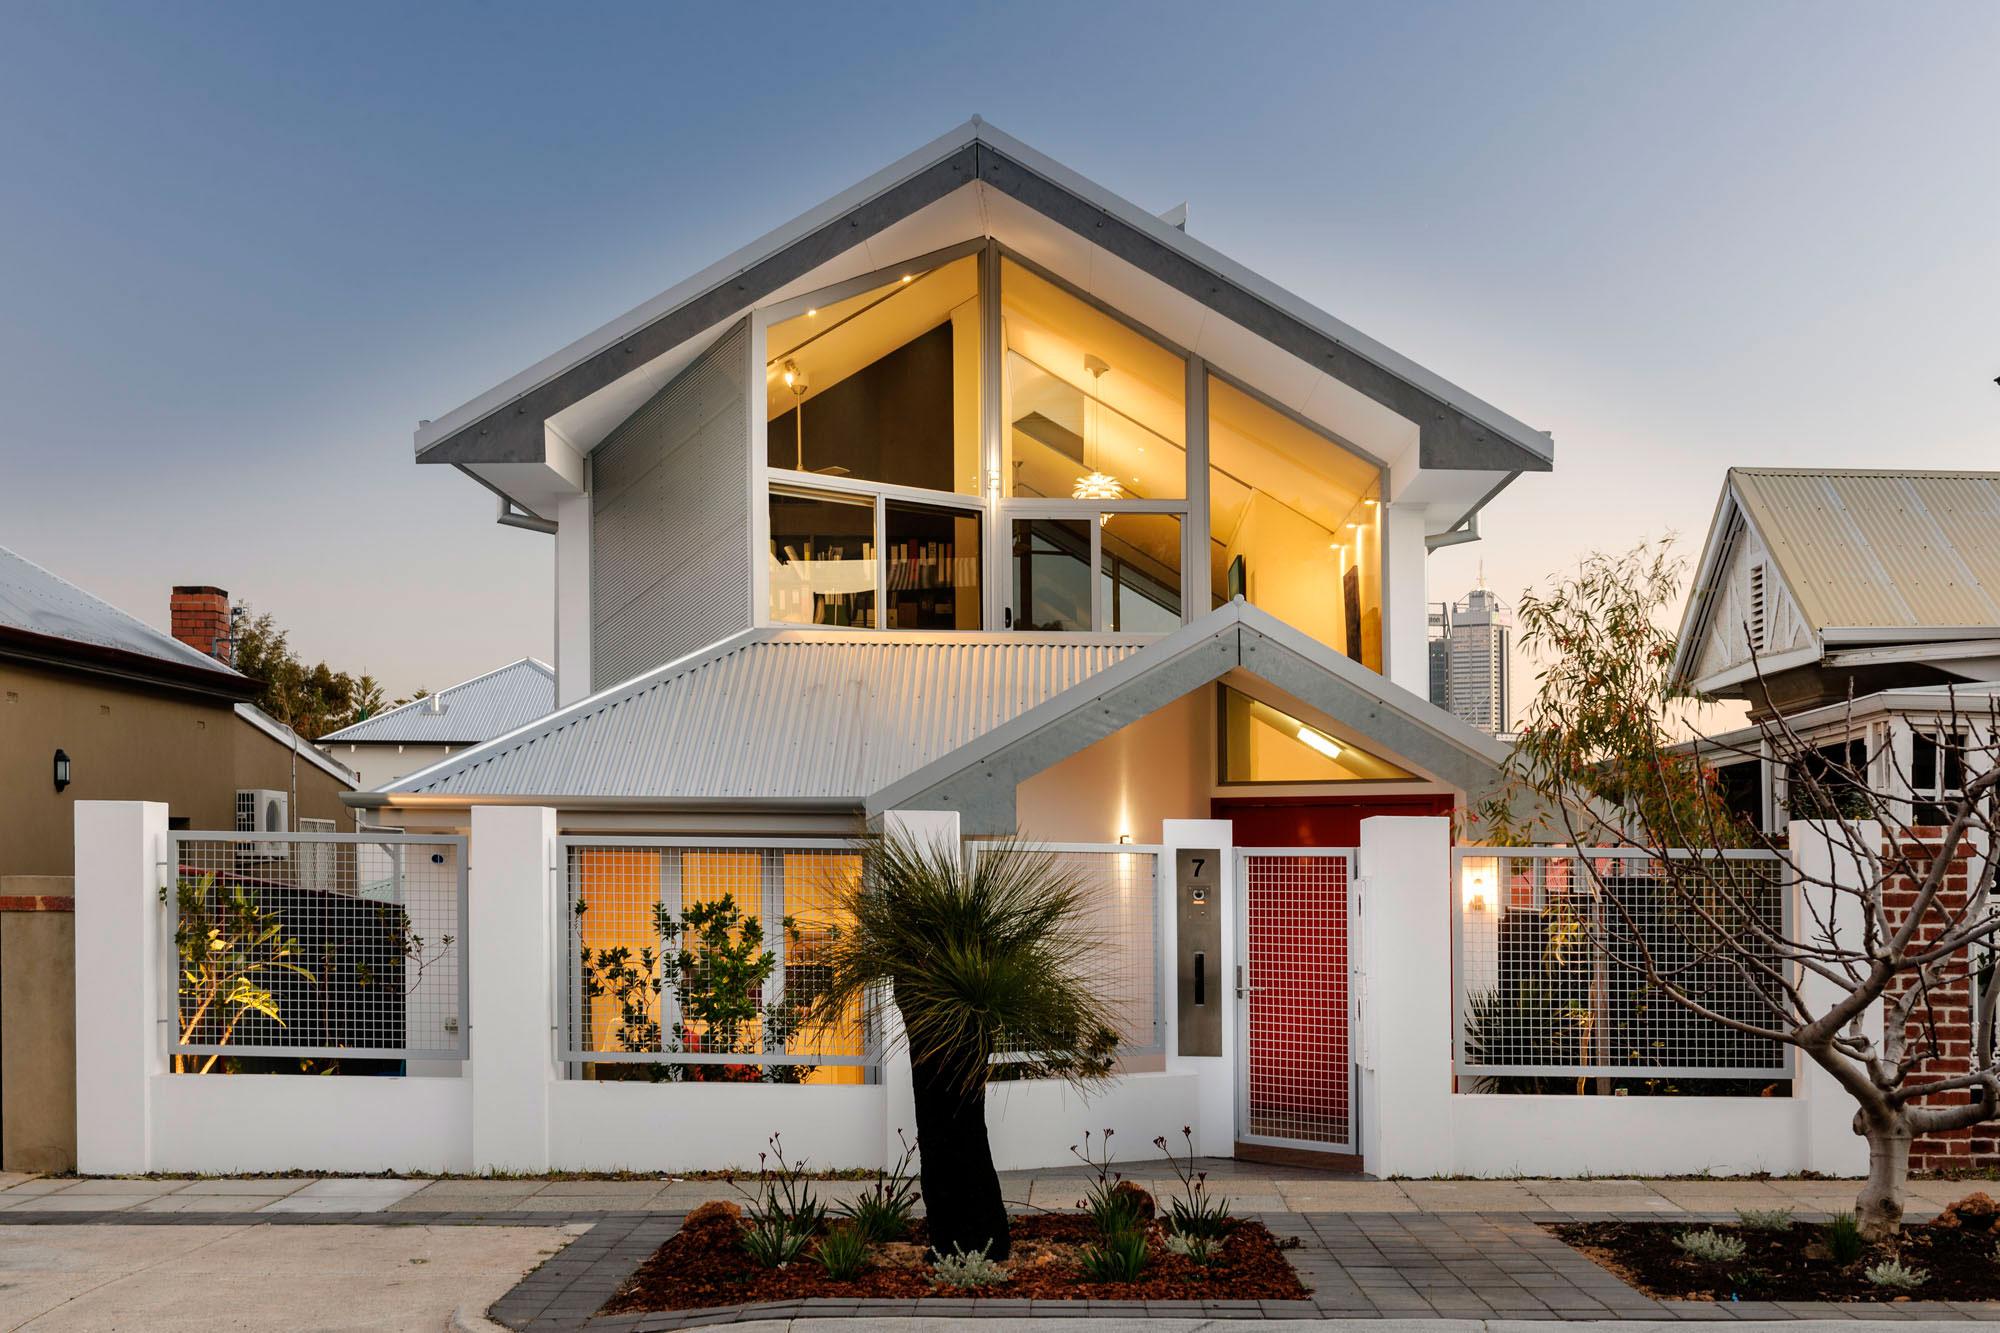 casas-con-techo-de-varias-aguas